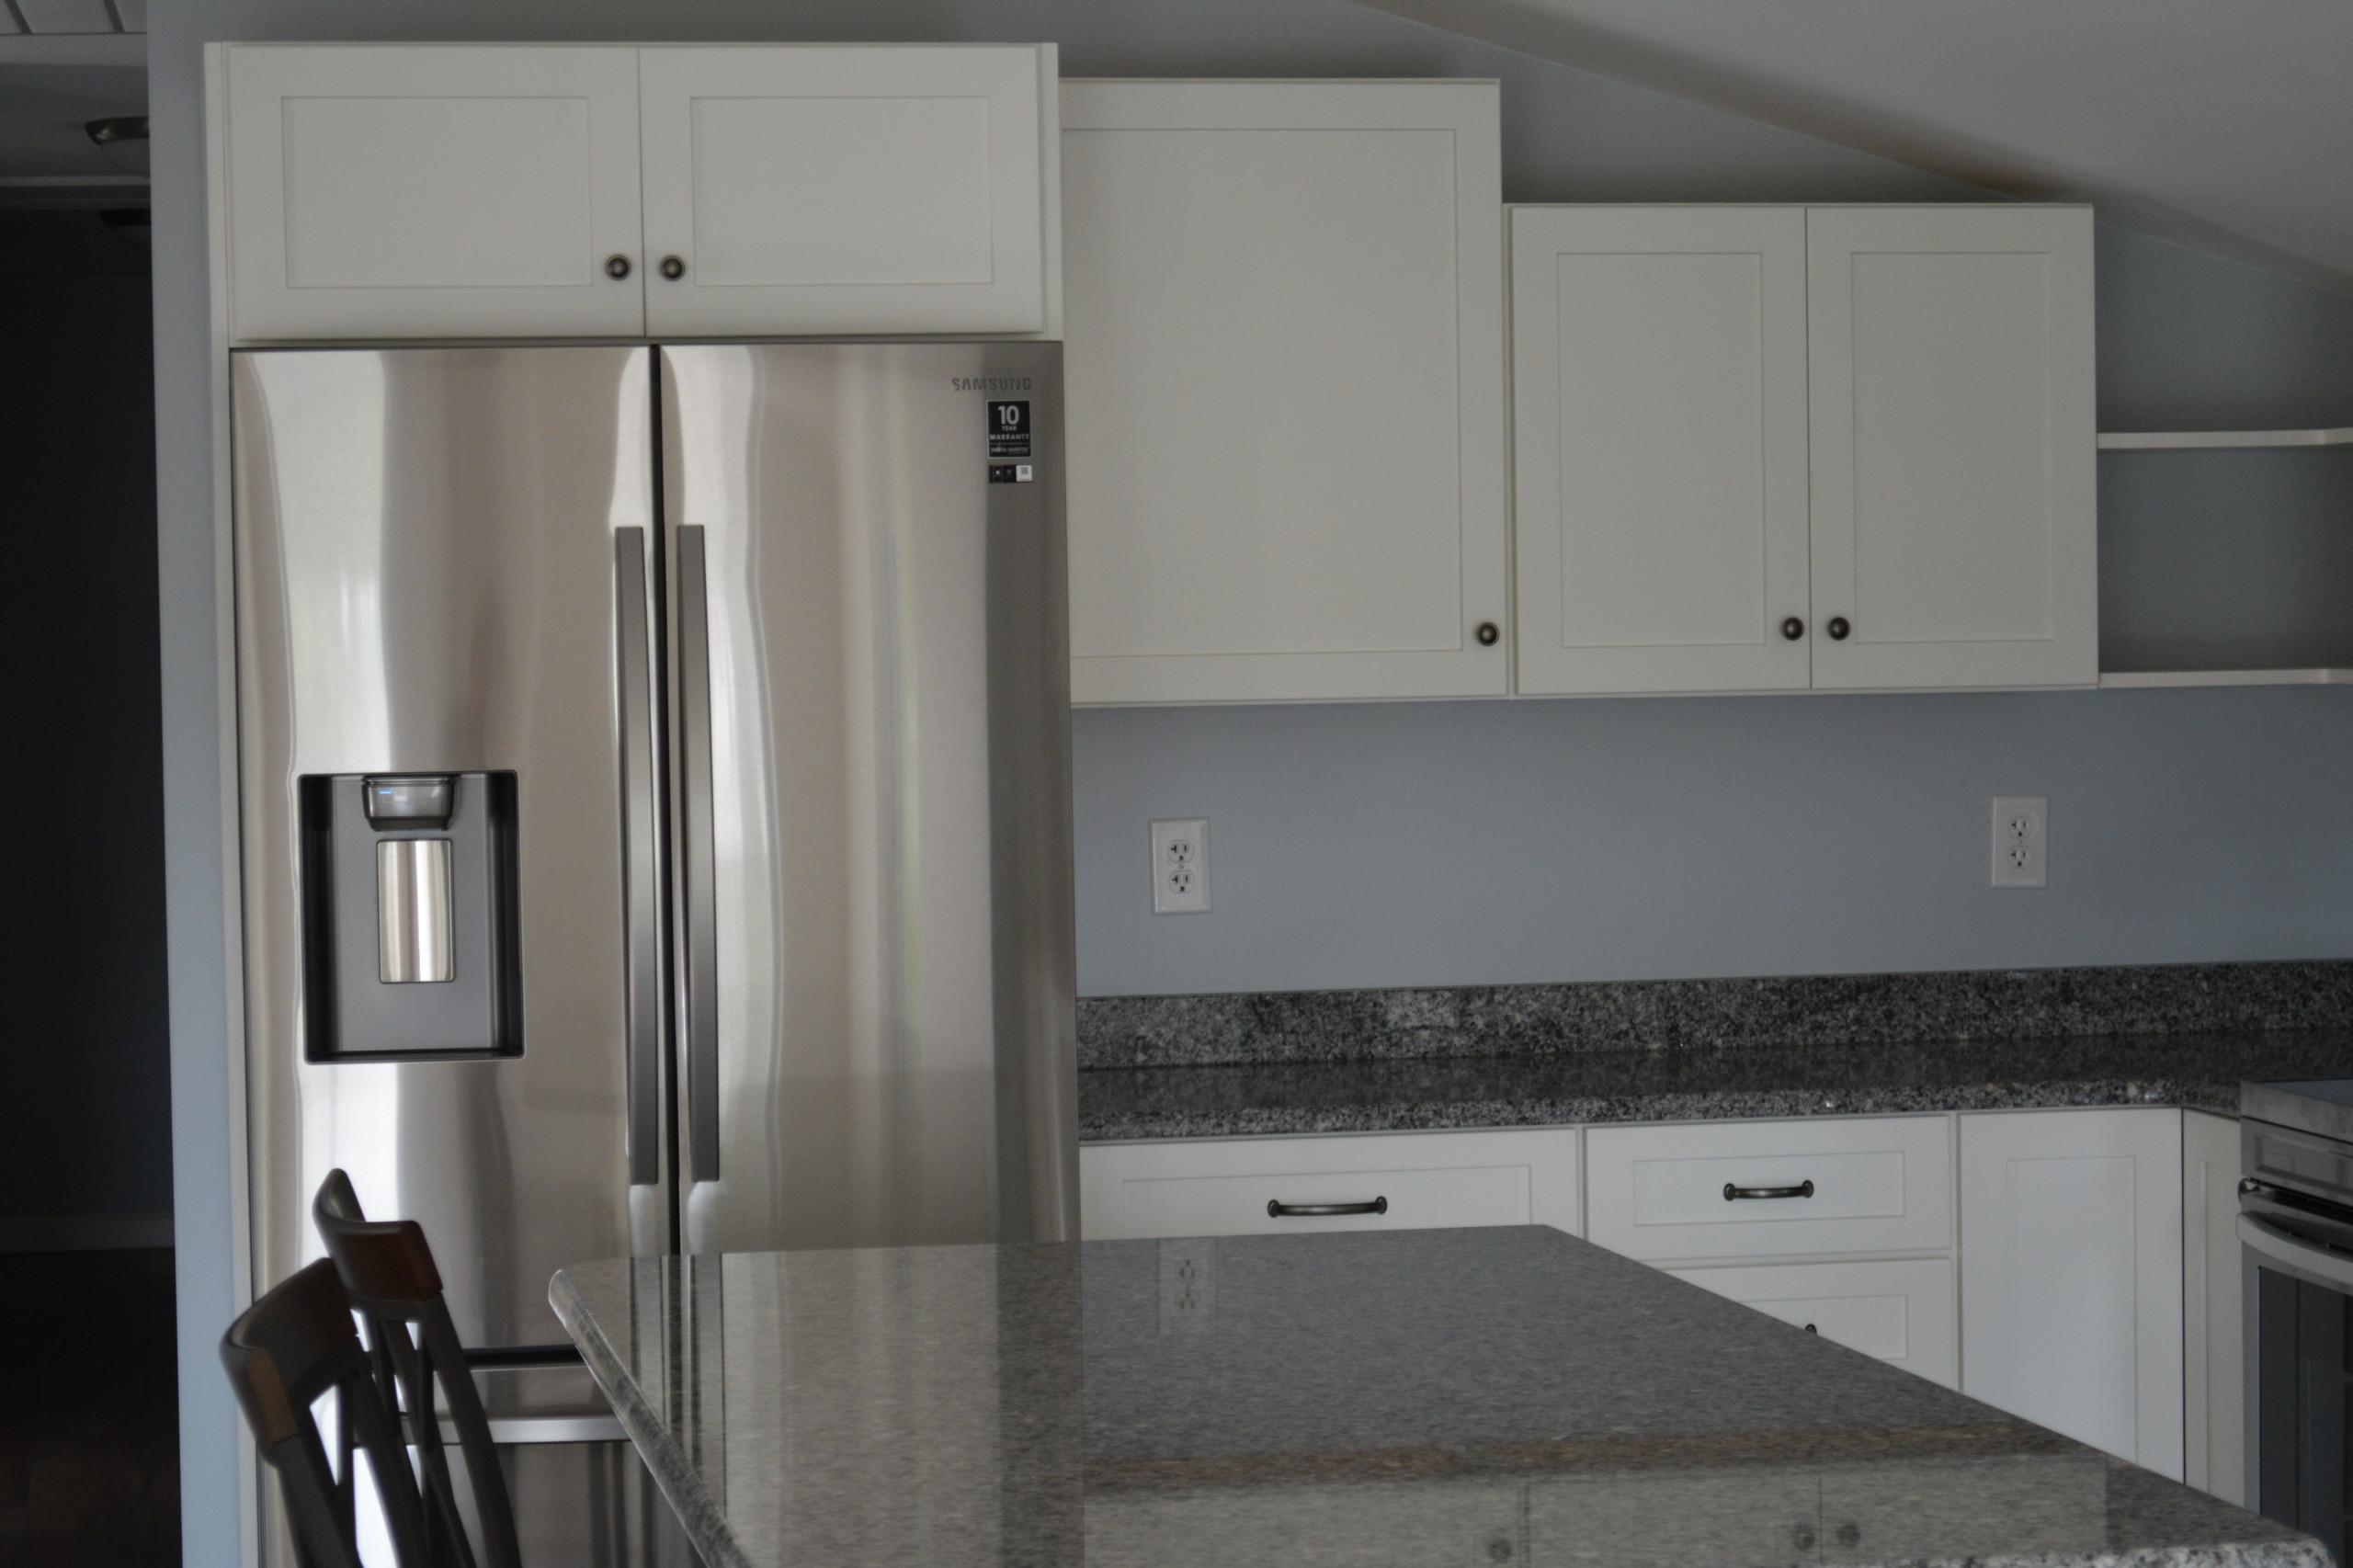 Azul Platino Granite with White Icing Cabinetry